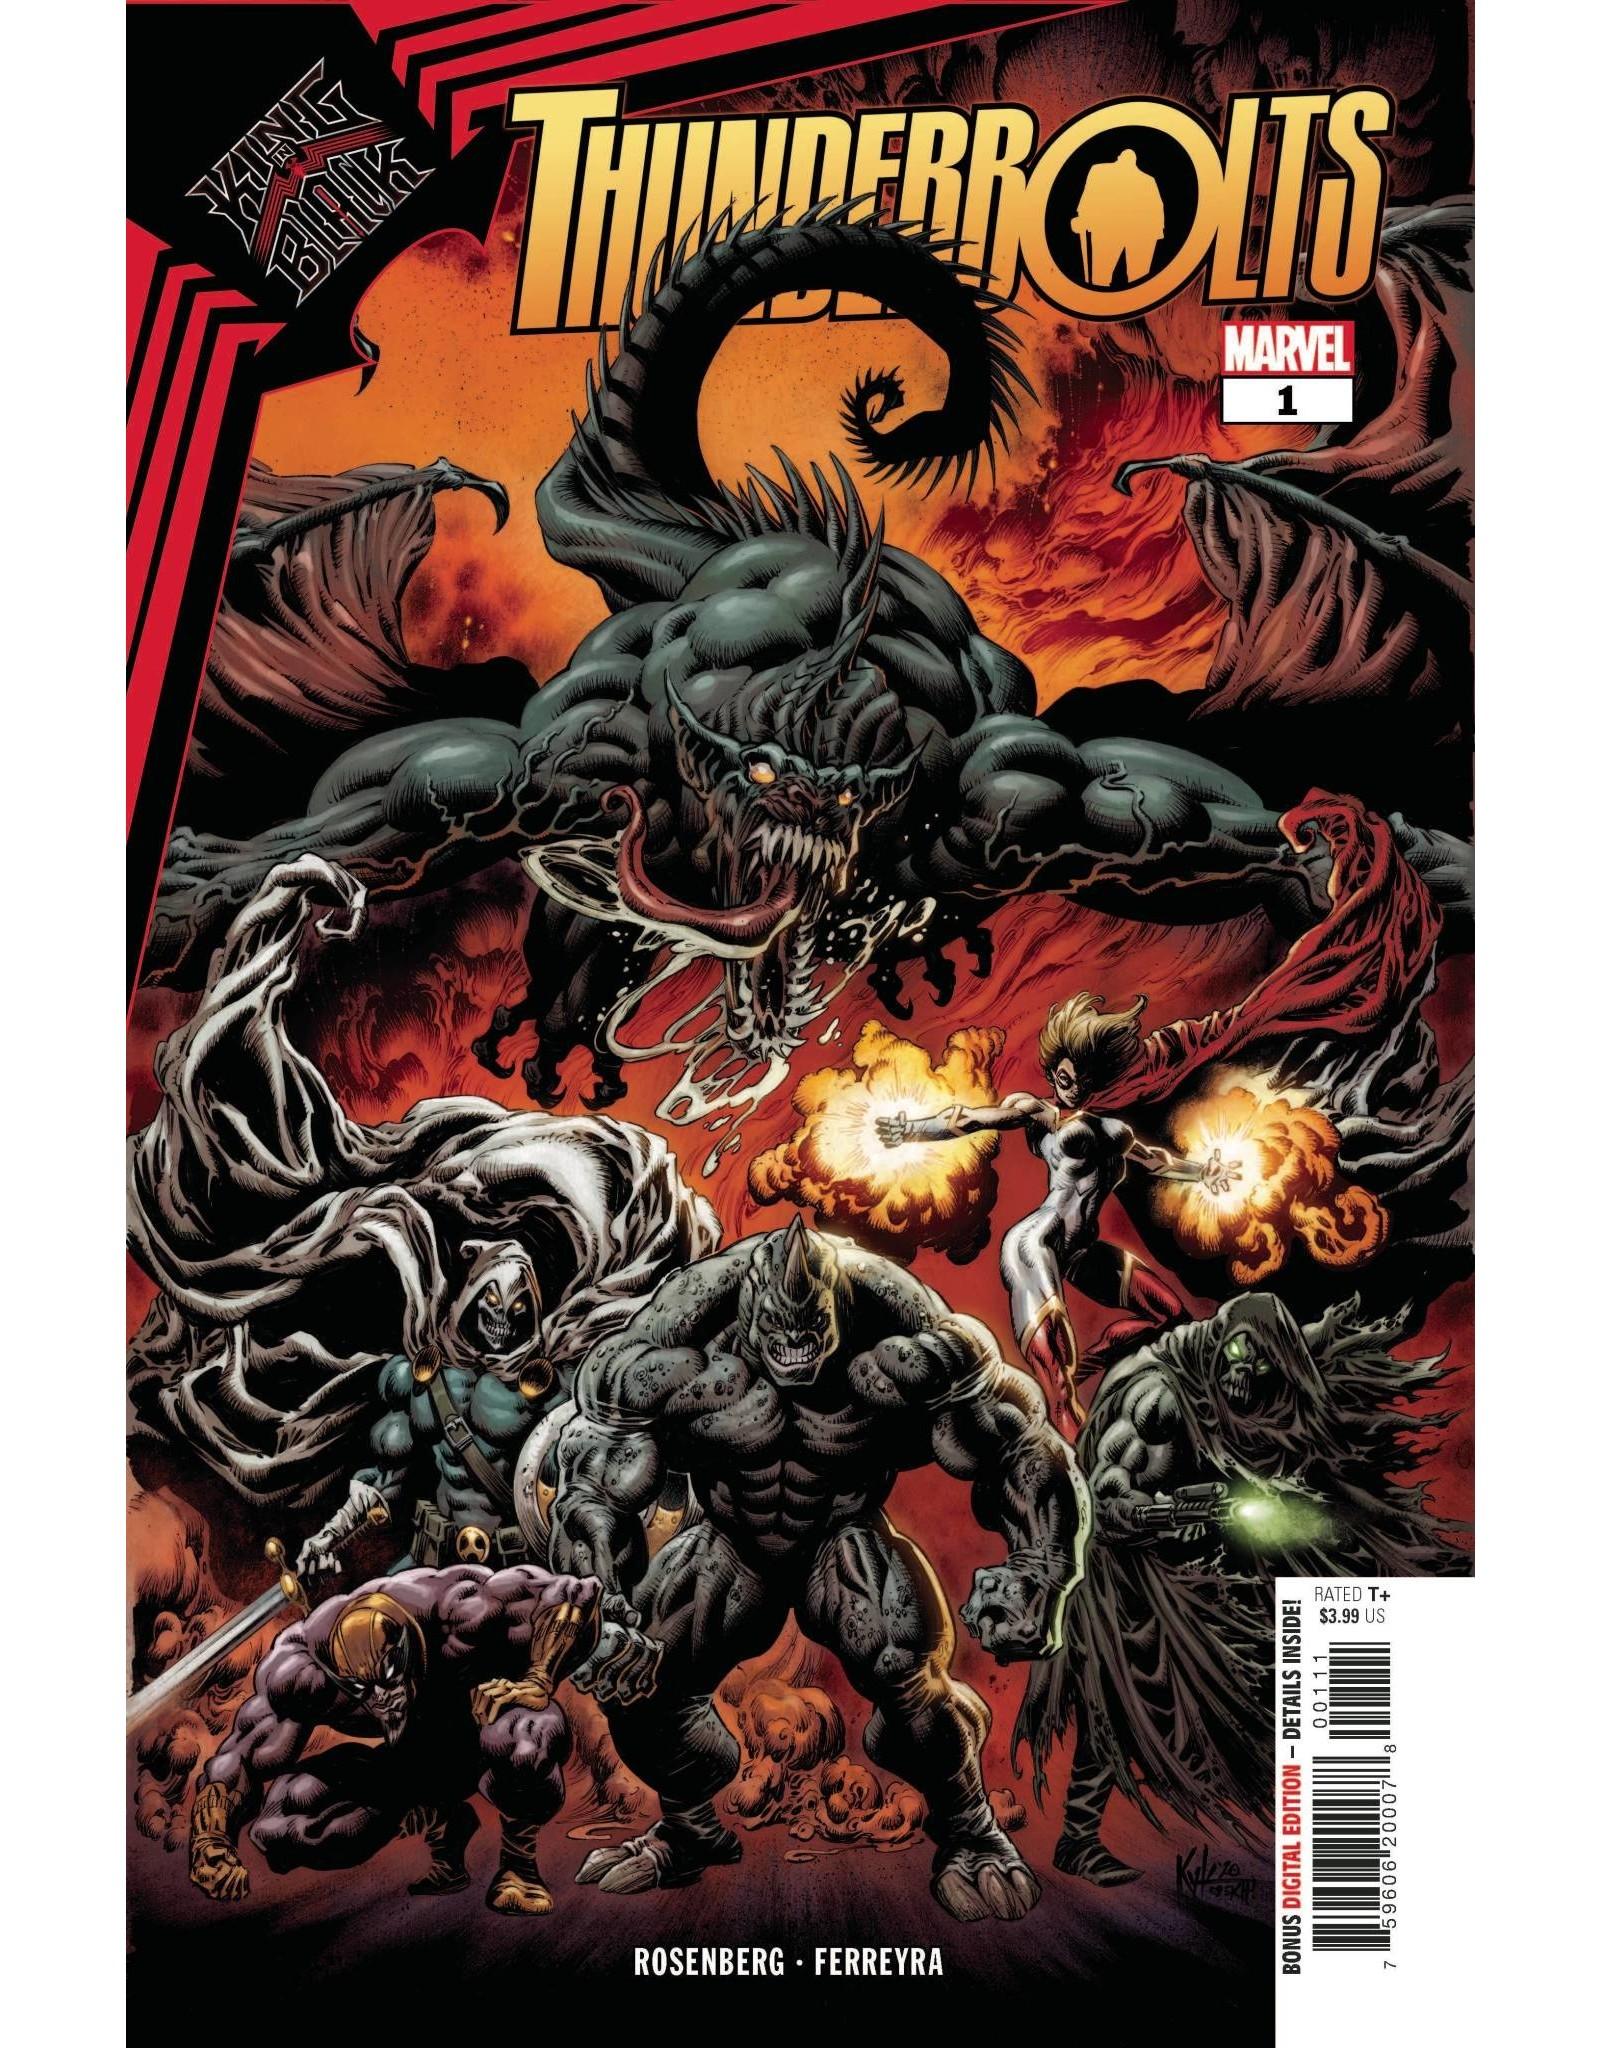 Marvel Comics KING IN BLACK THUNDERBOLTS #1 (OF 3)